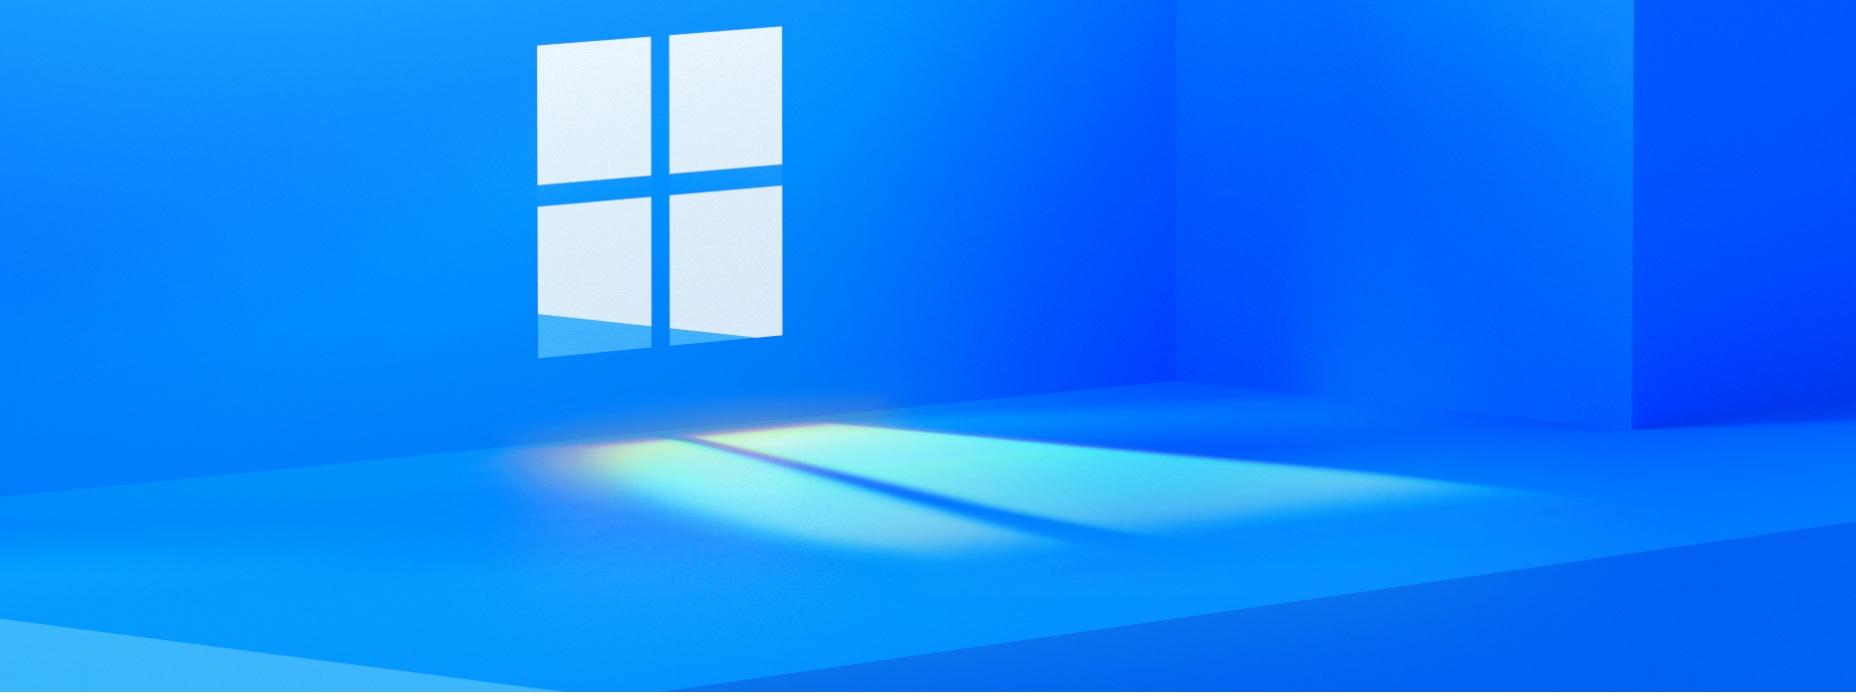 Microsoft Windows Event Watch the June 24 LIVE stream